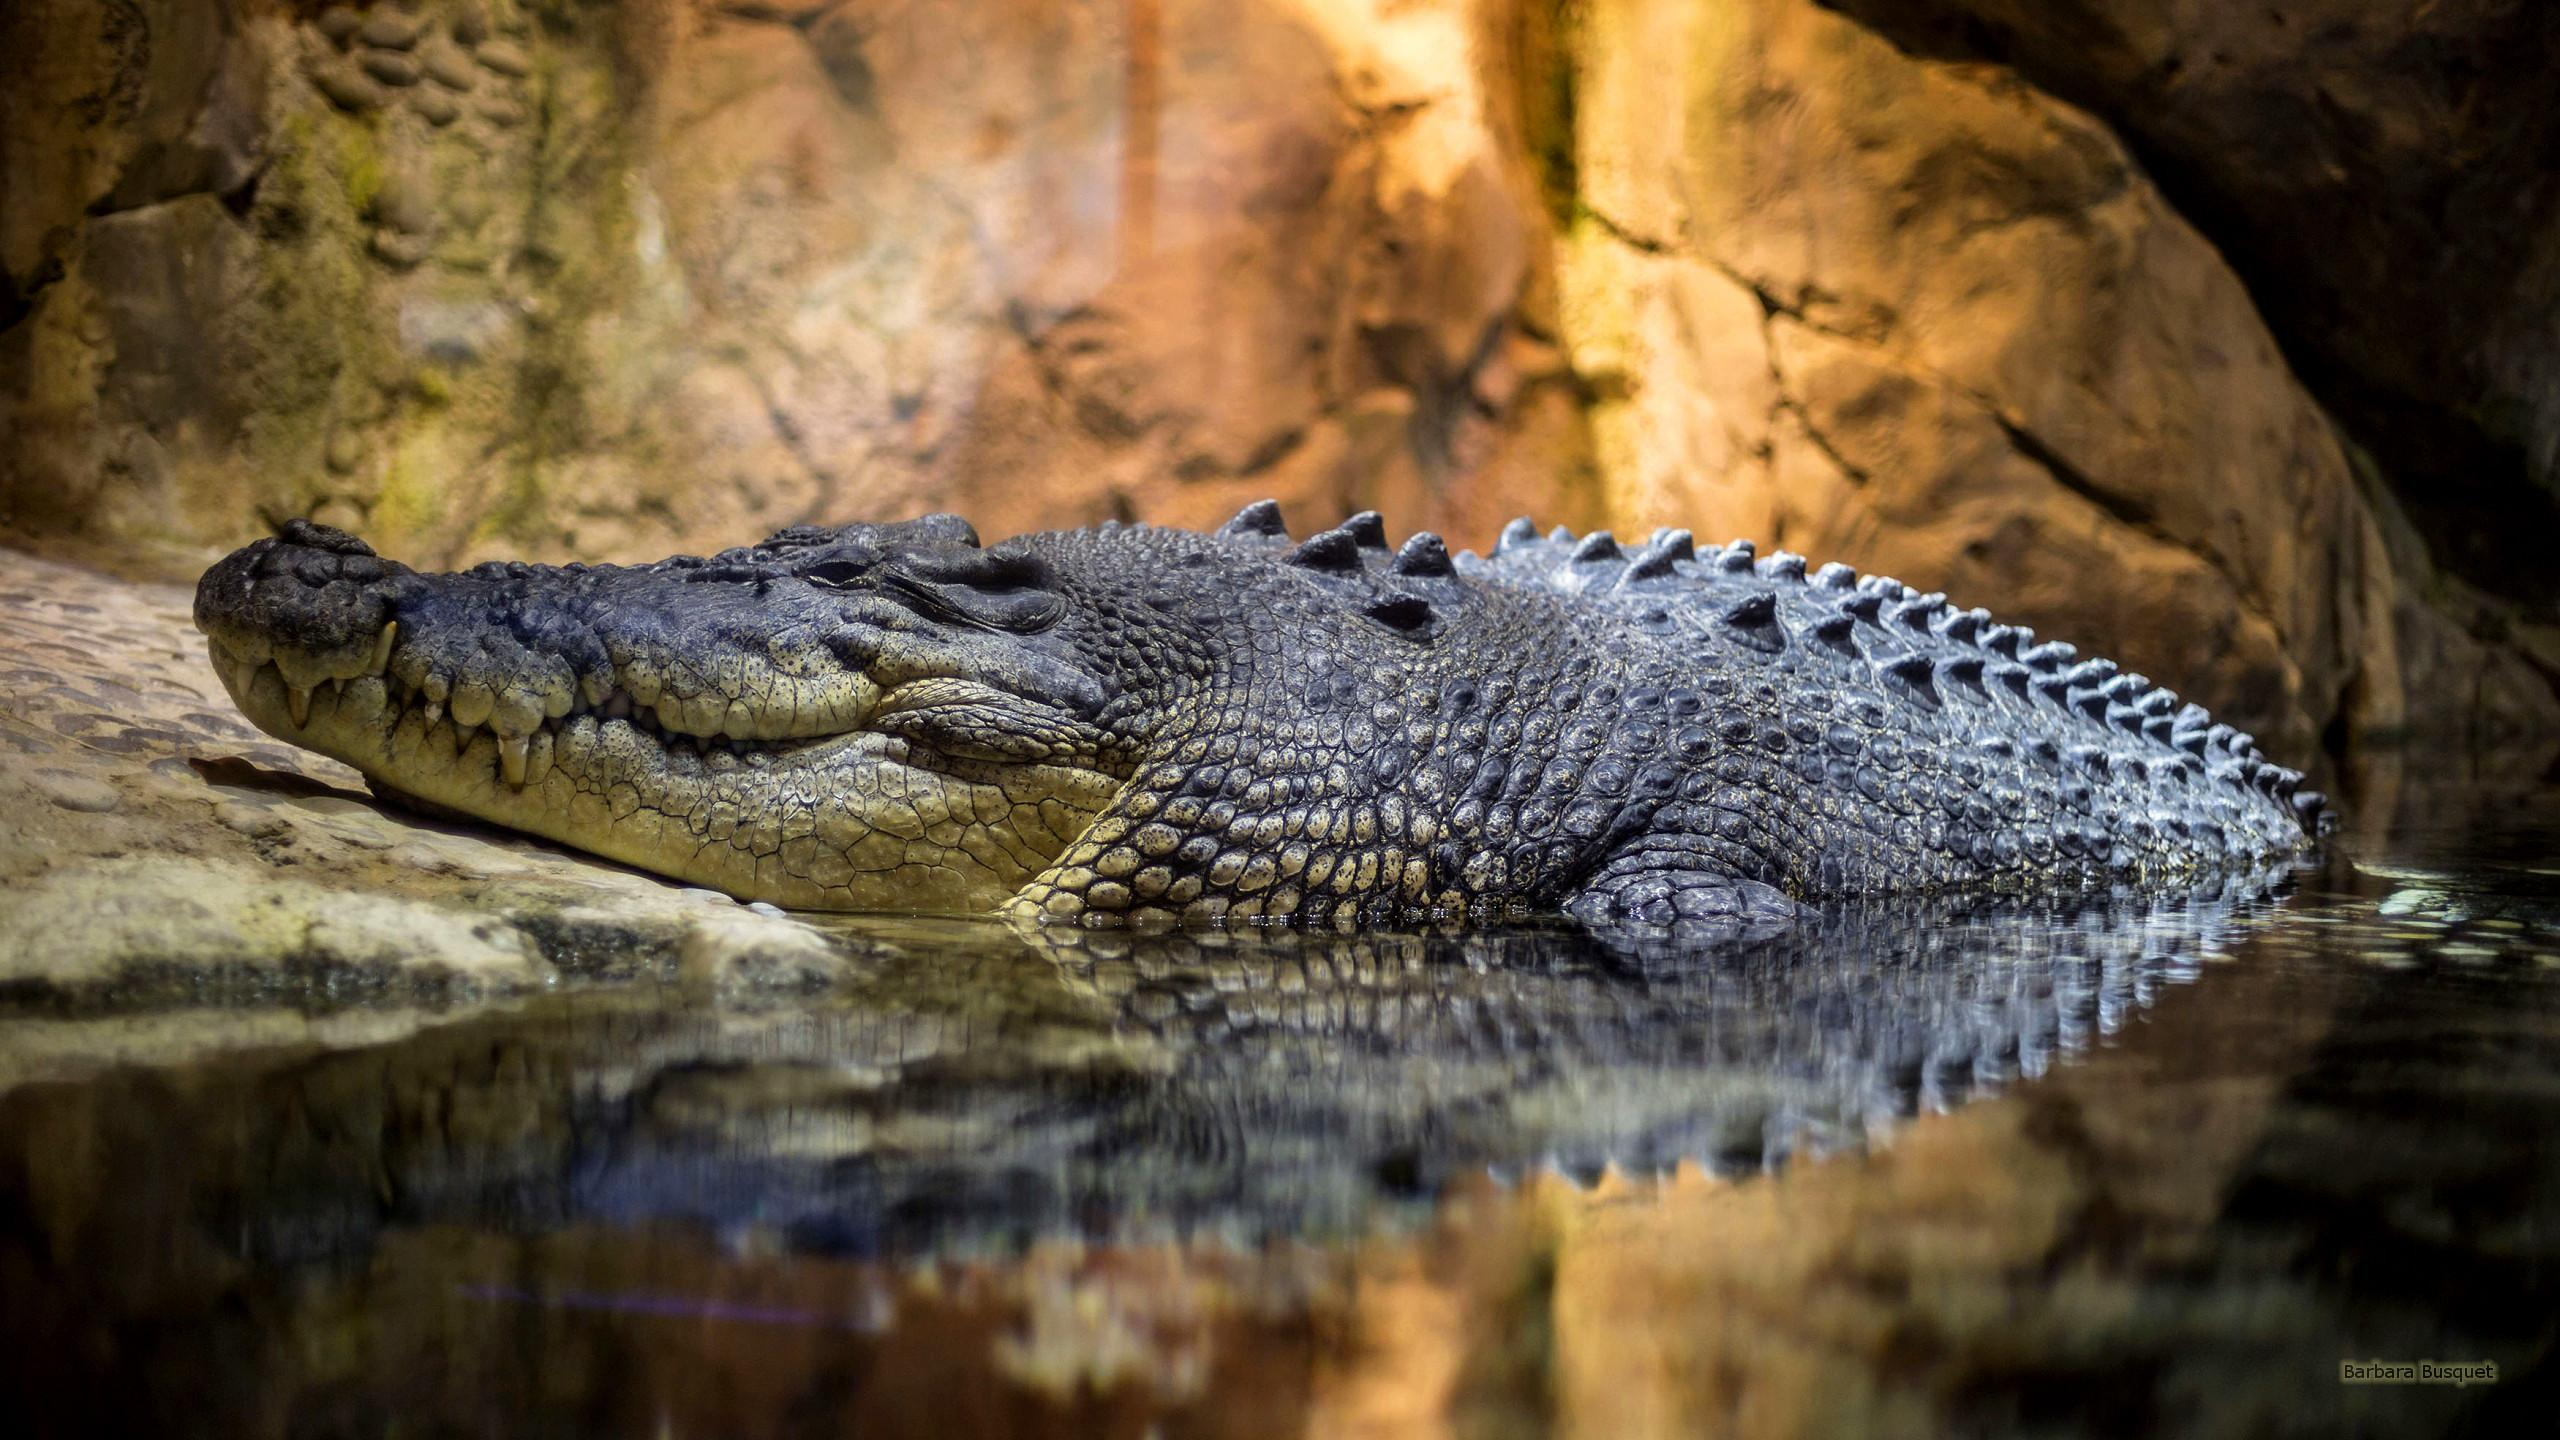 Crocodile Wallpapers Wallpaper Cave